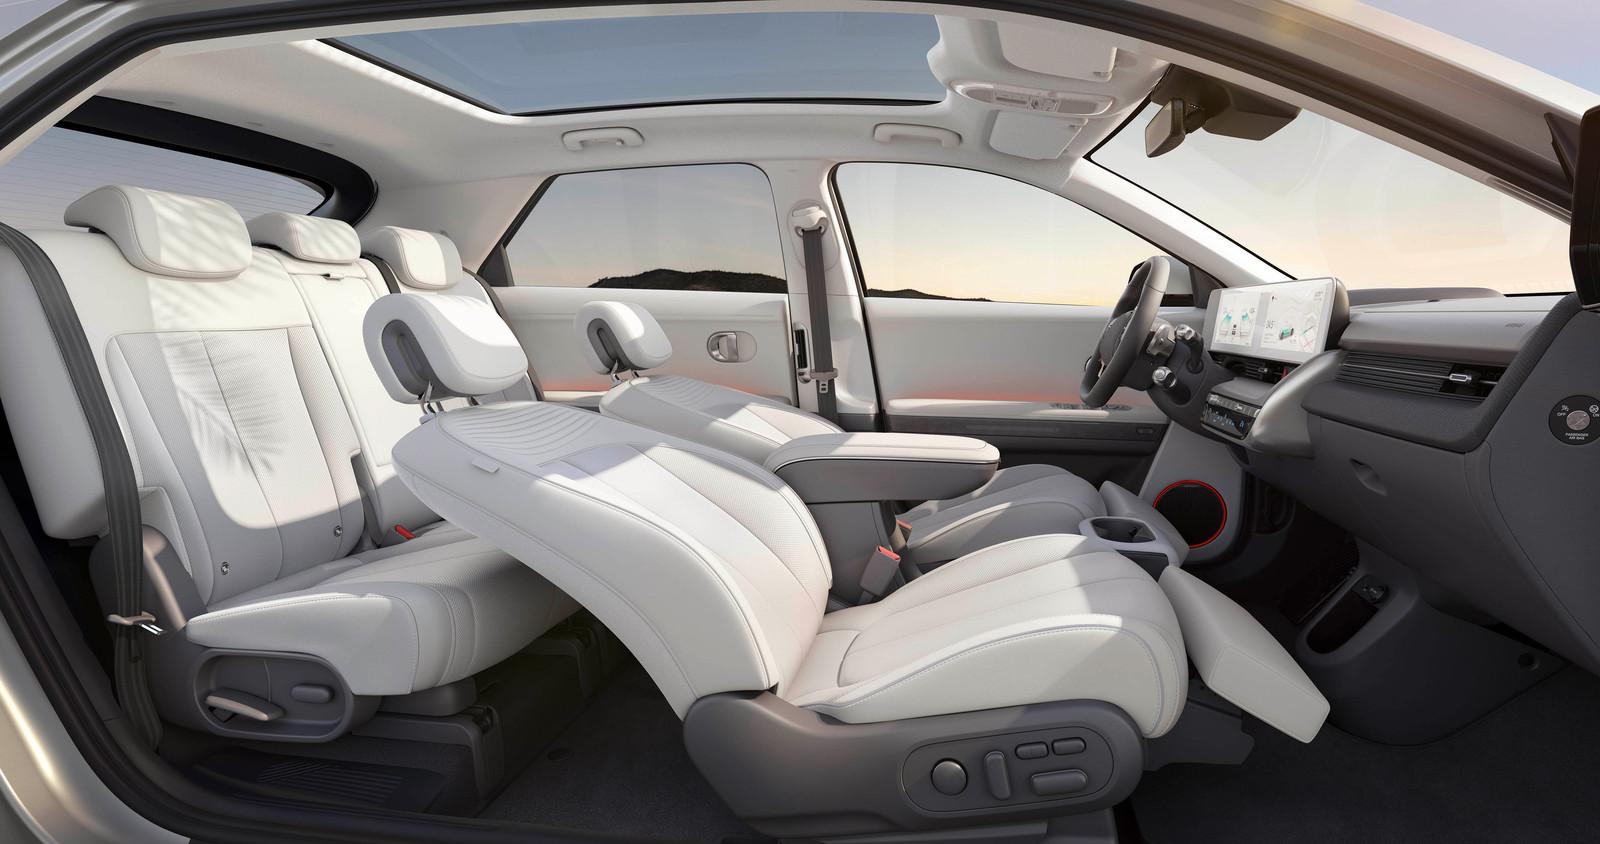 De relaxstoelen van de Hyundai Ioniq 5